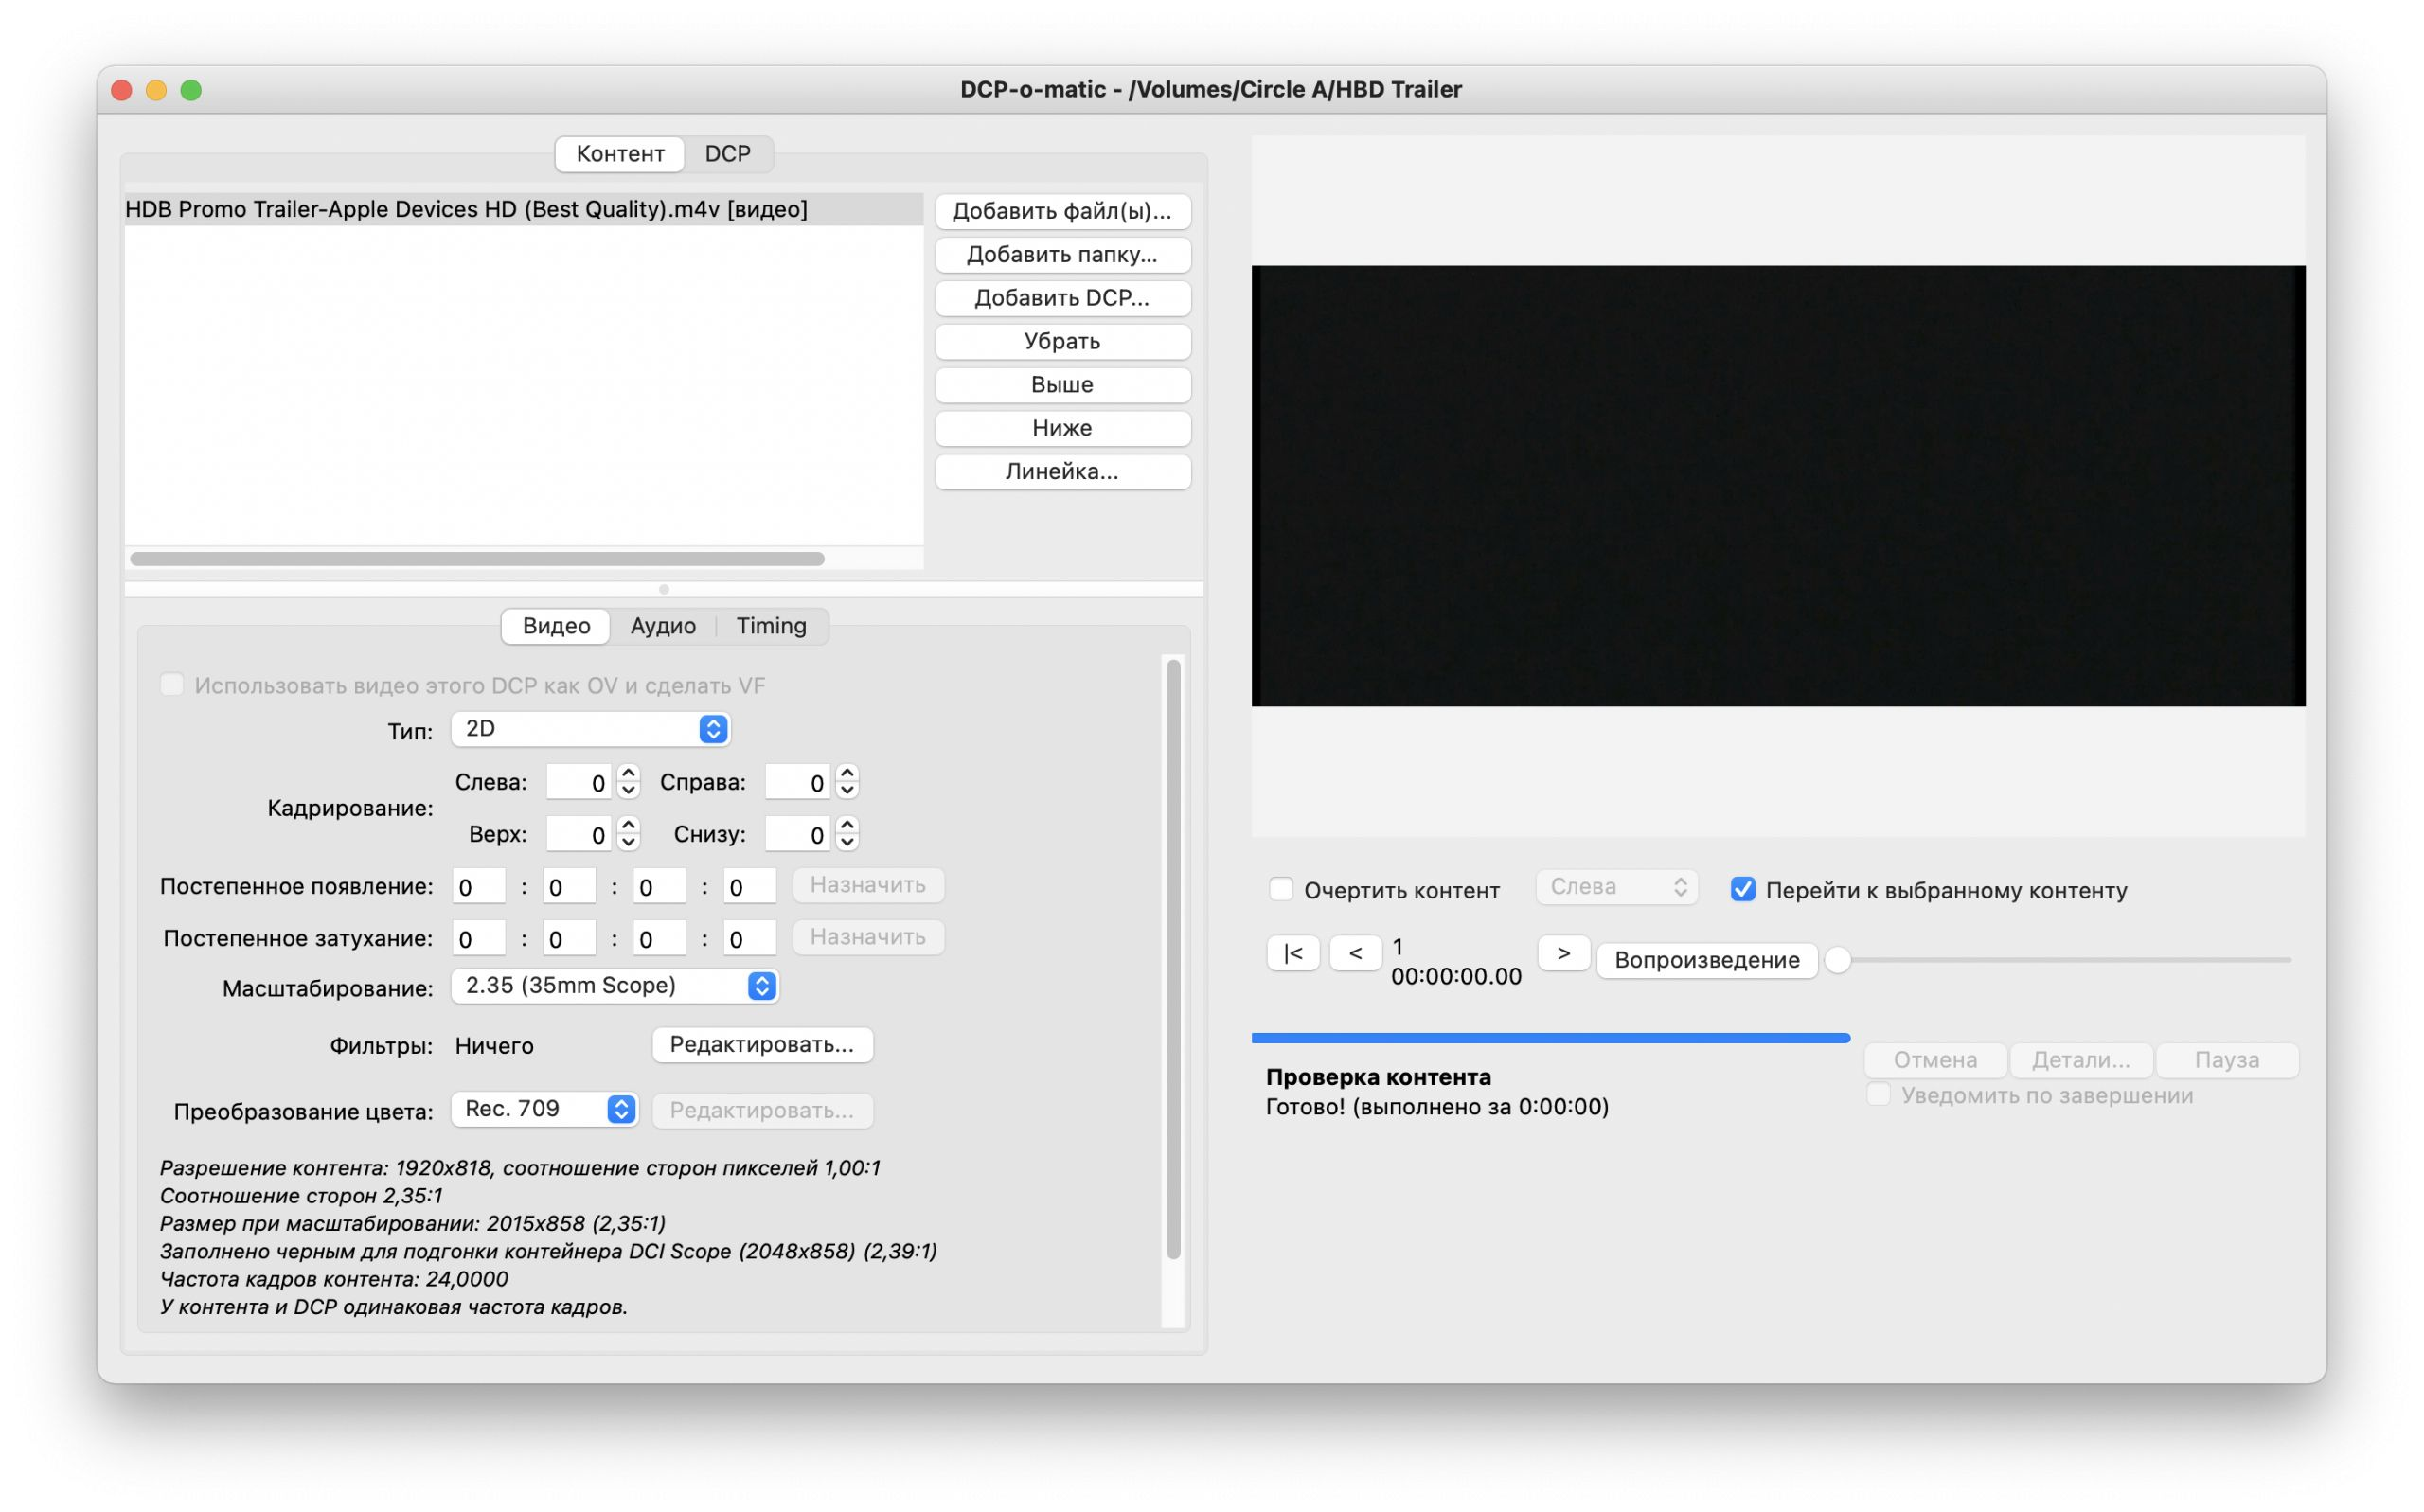 DCP-o-matic проверку файл прошел